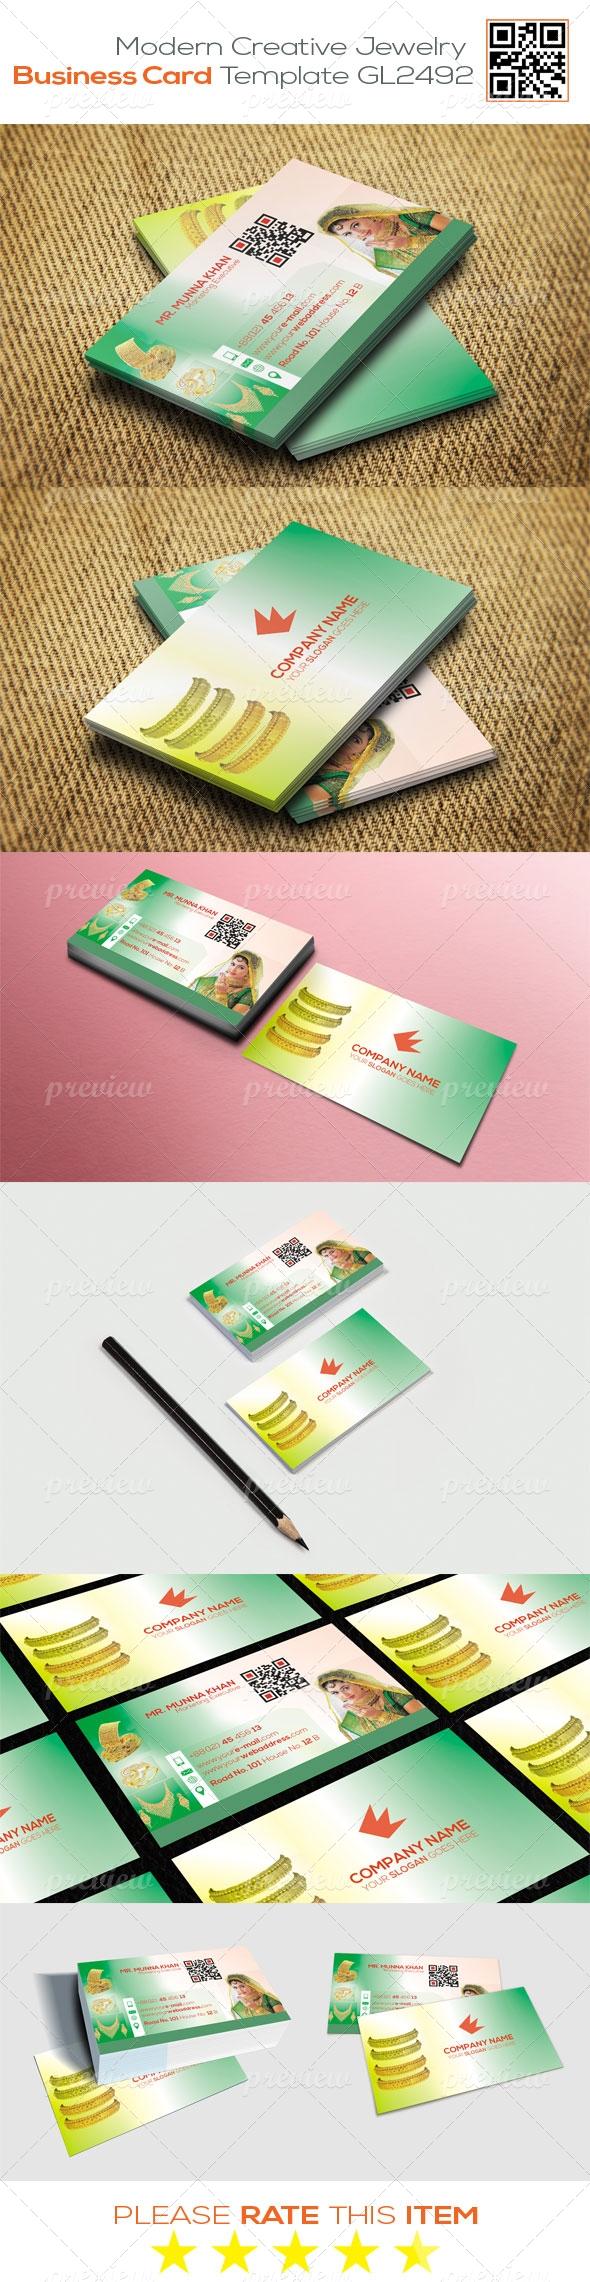 Modern Creative Jewelry  Business Card Template GL2492